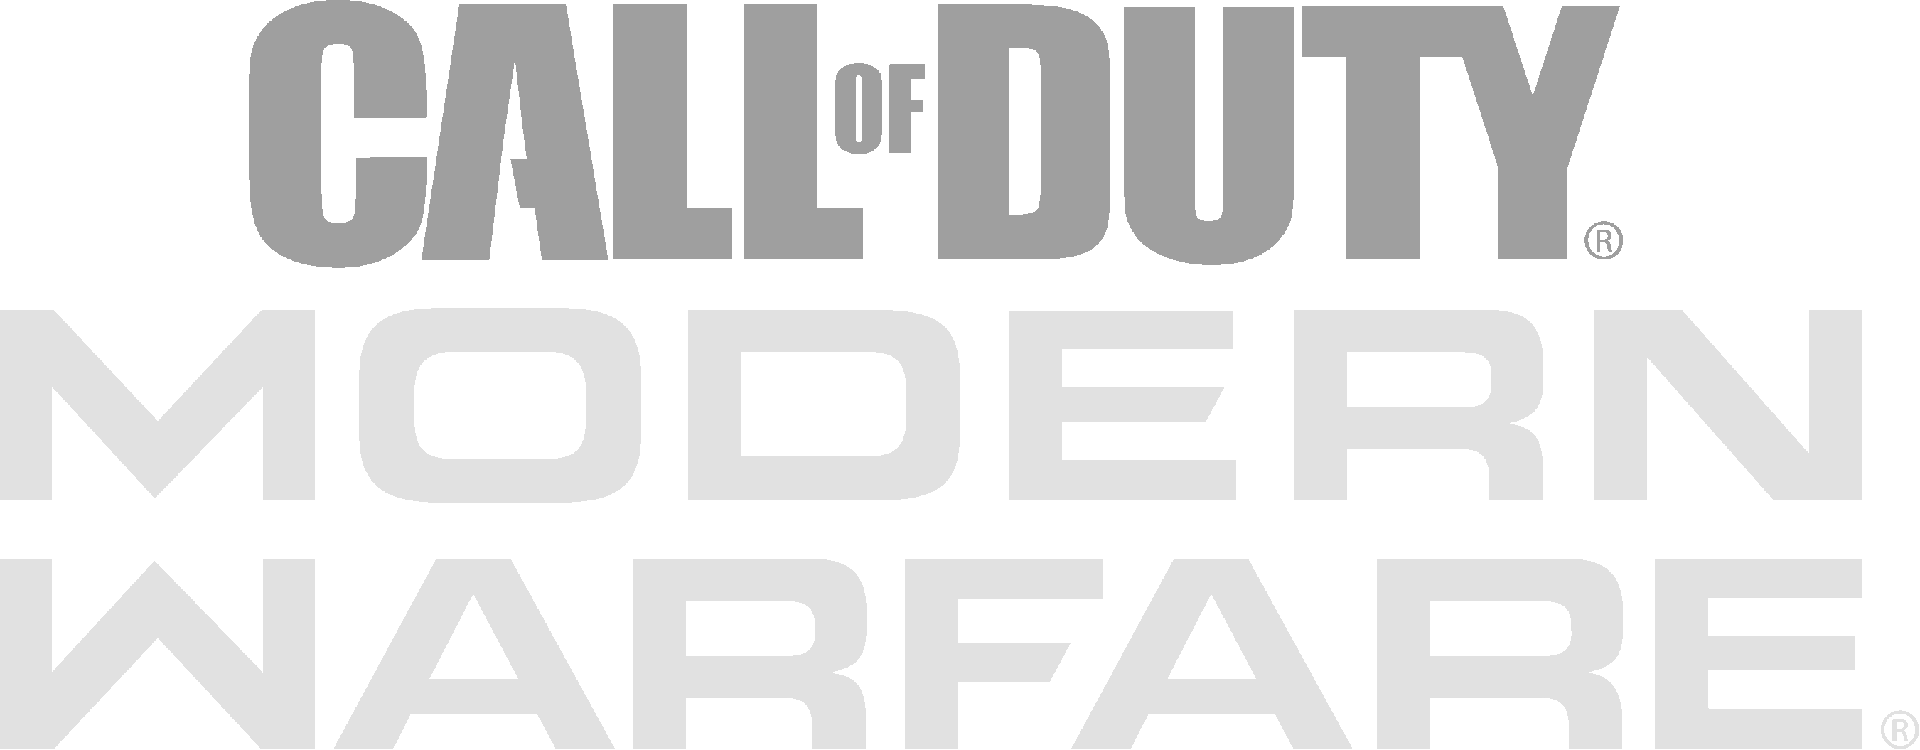 Call Of Duty Modern Warfare 2019 Call Of Duty Wiki Fandom